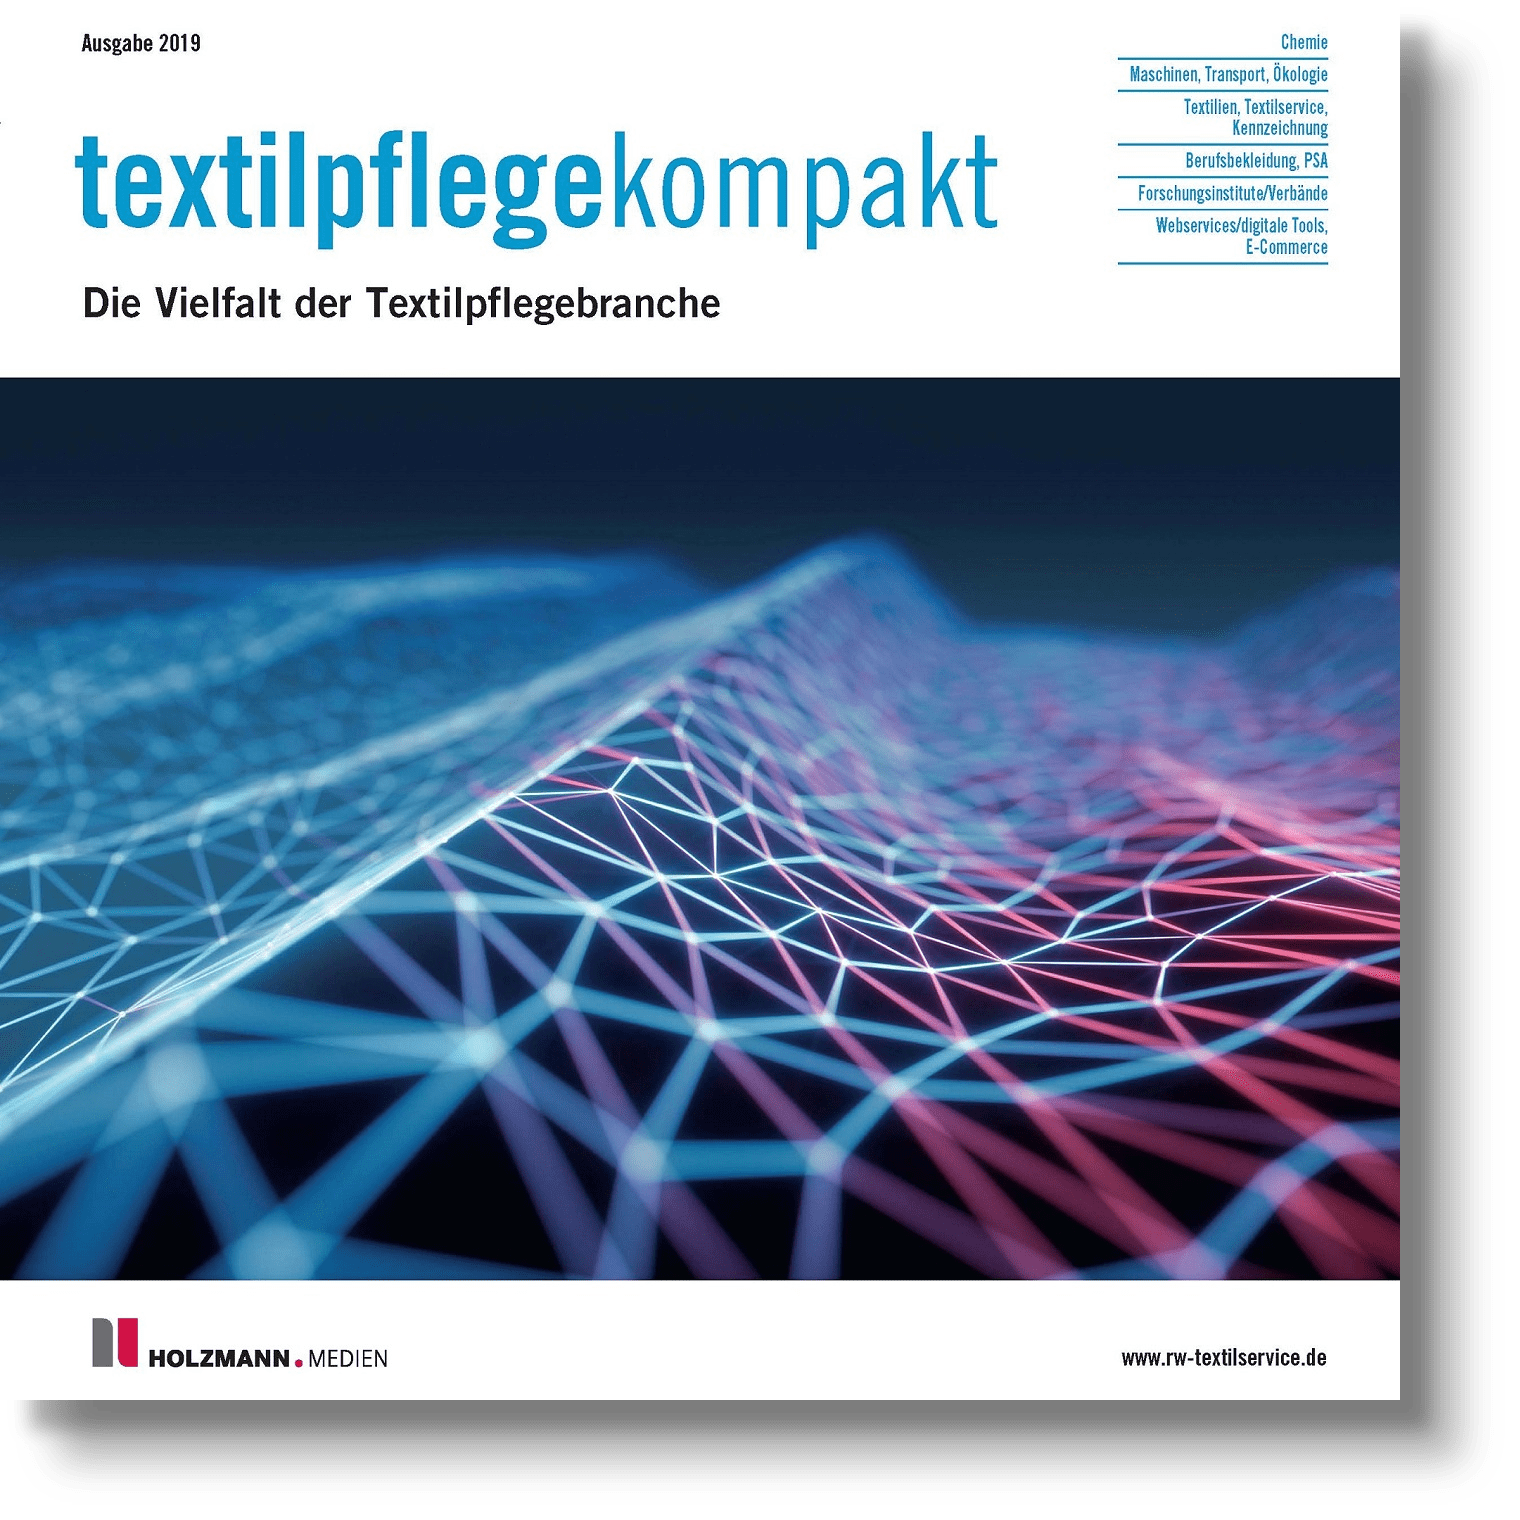 textilpflege kompakt 2019